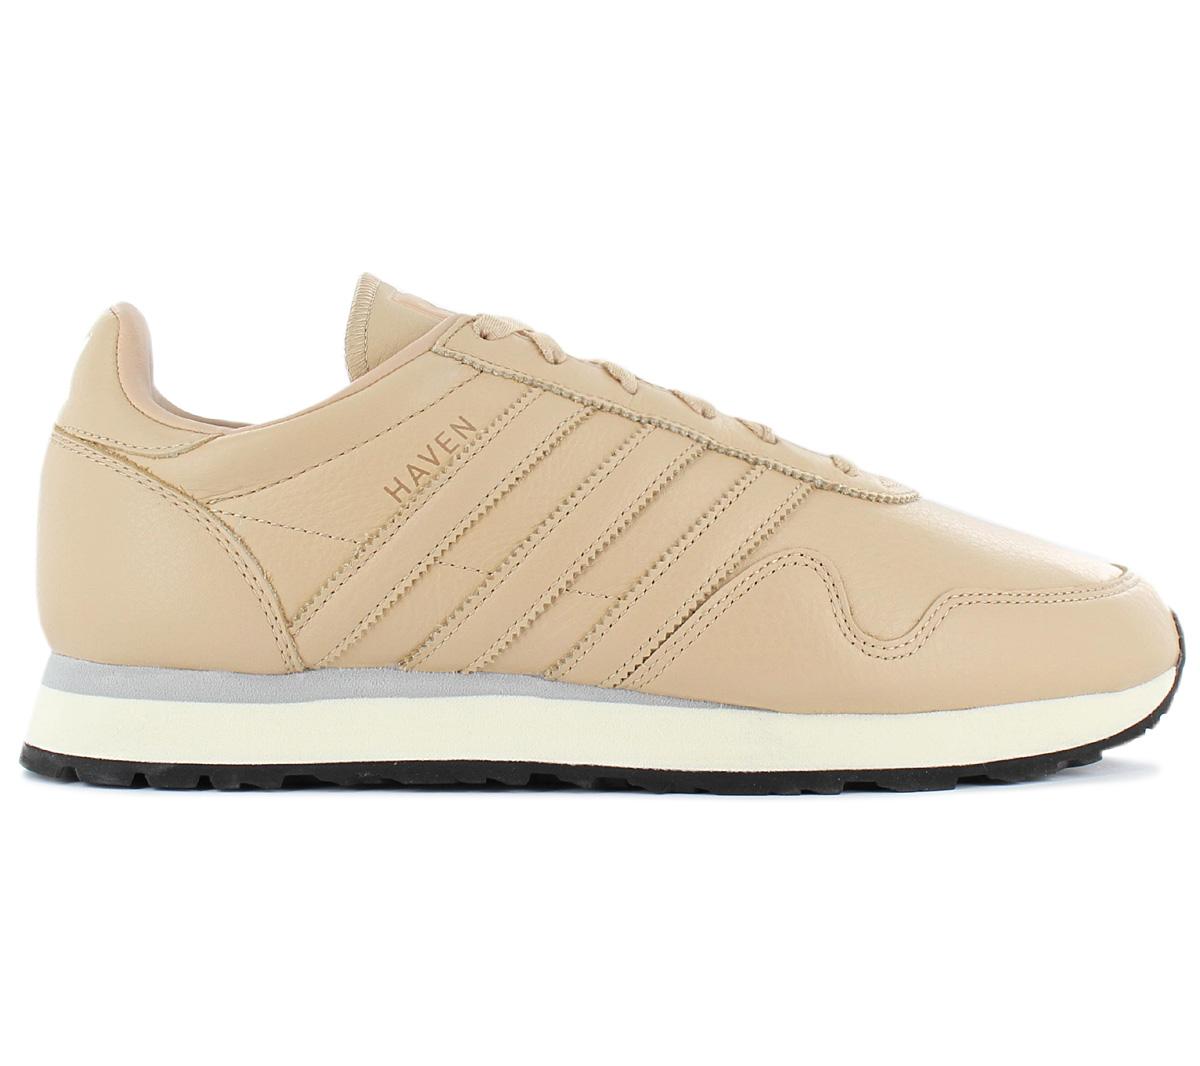 79e4edc5a8d223 Adidas Originals Haven Leather Men s Sneakers Shoes Leather Beige ...